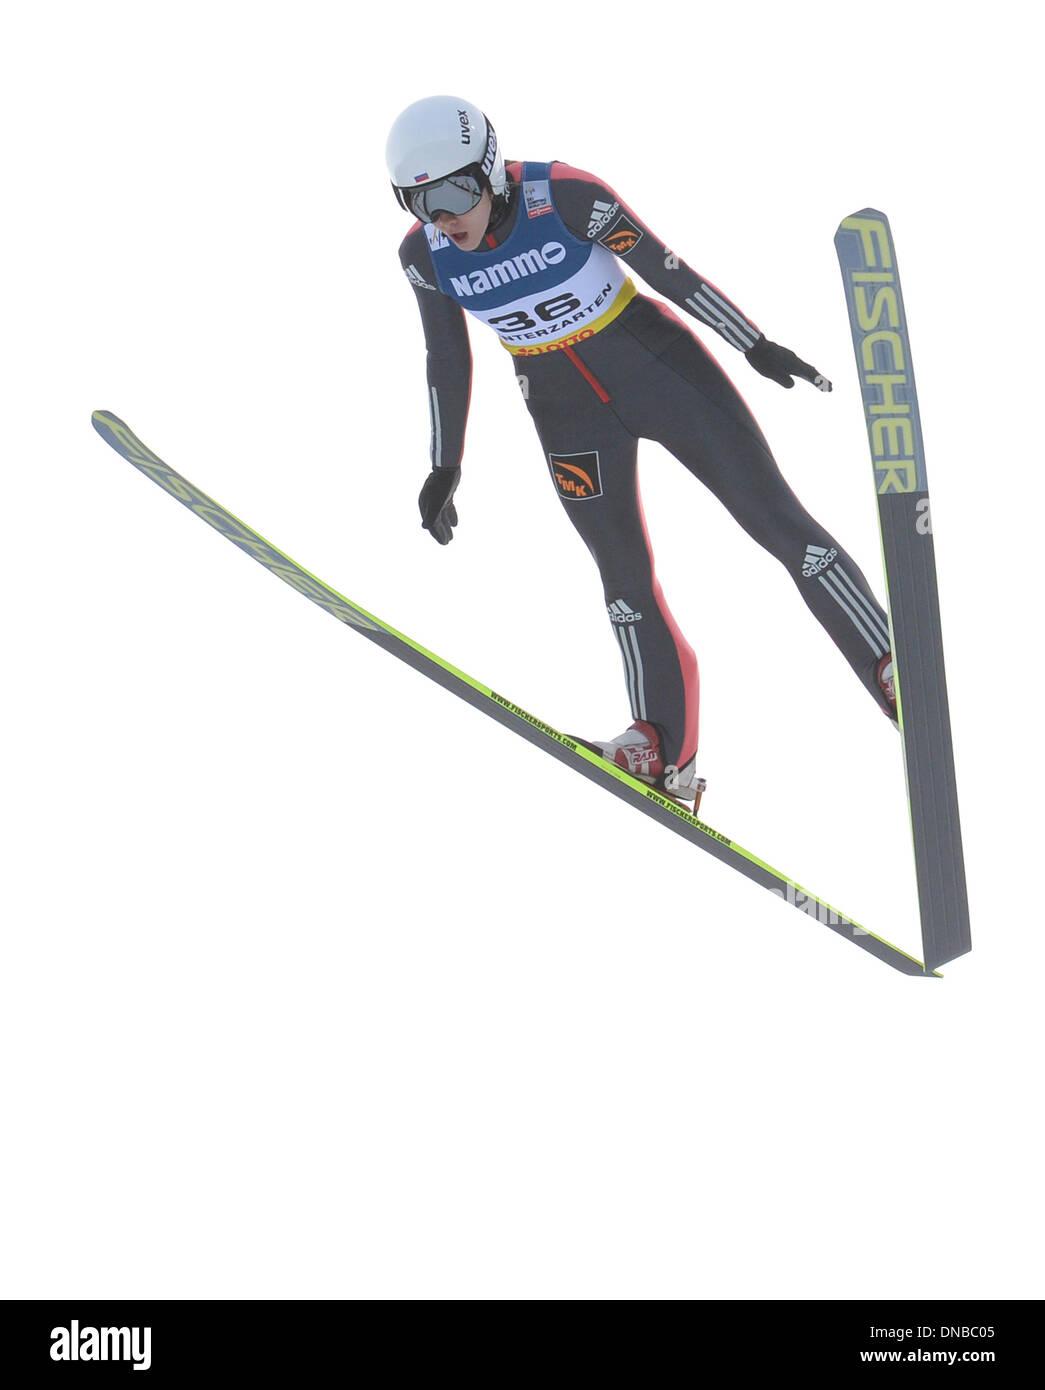 Hinterzarten, Germany. 21st Dec, 2013. Russia's Irina Avvakumova comes in third place at the ski jumping world cup in Hinterzarten, Germany, 21 December 2013. Photo: PATRICK SEEGER/dpa/Alamy Live News - Stock Image